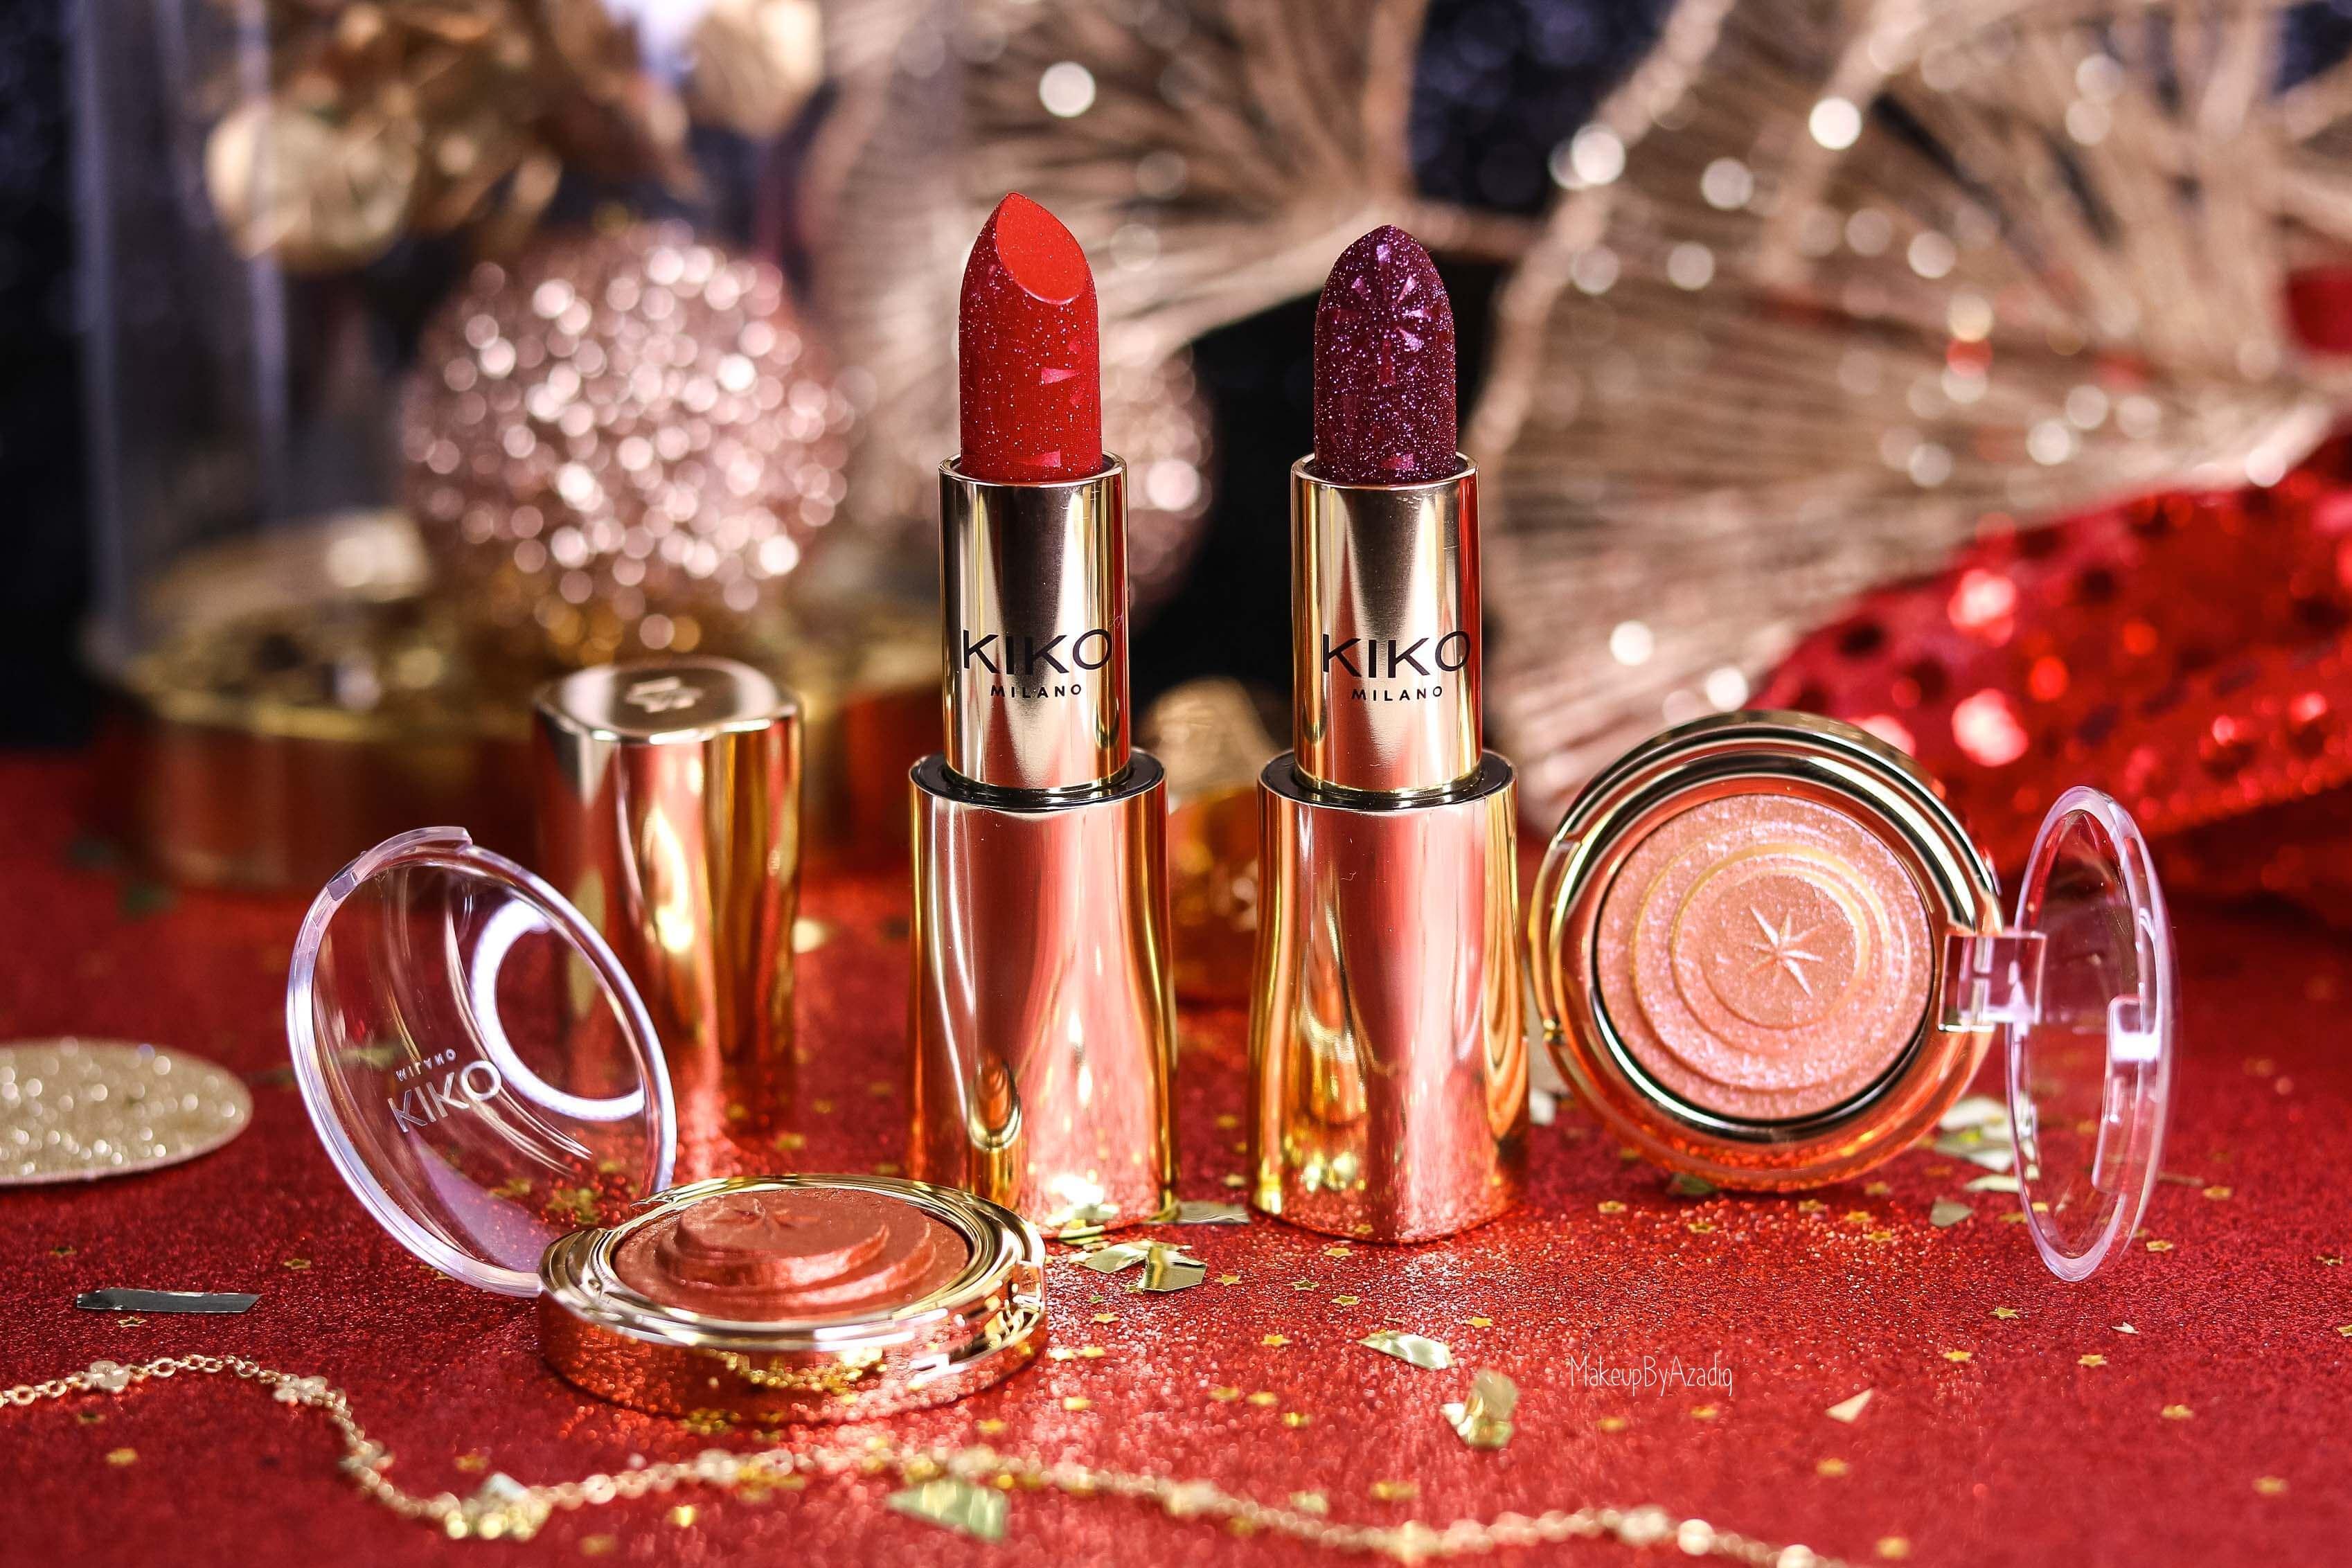 revue-collection-noel-kiko-milano-troyes-magical-holiday-rouge-levres-fard-paupieres-makeupbyazadig-avis-prix-swatch-paillete-2019-miniature